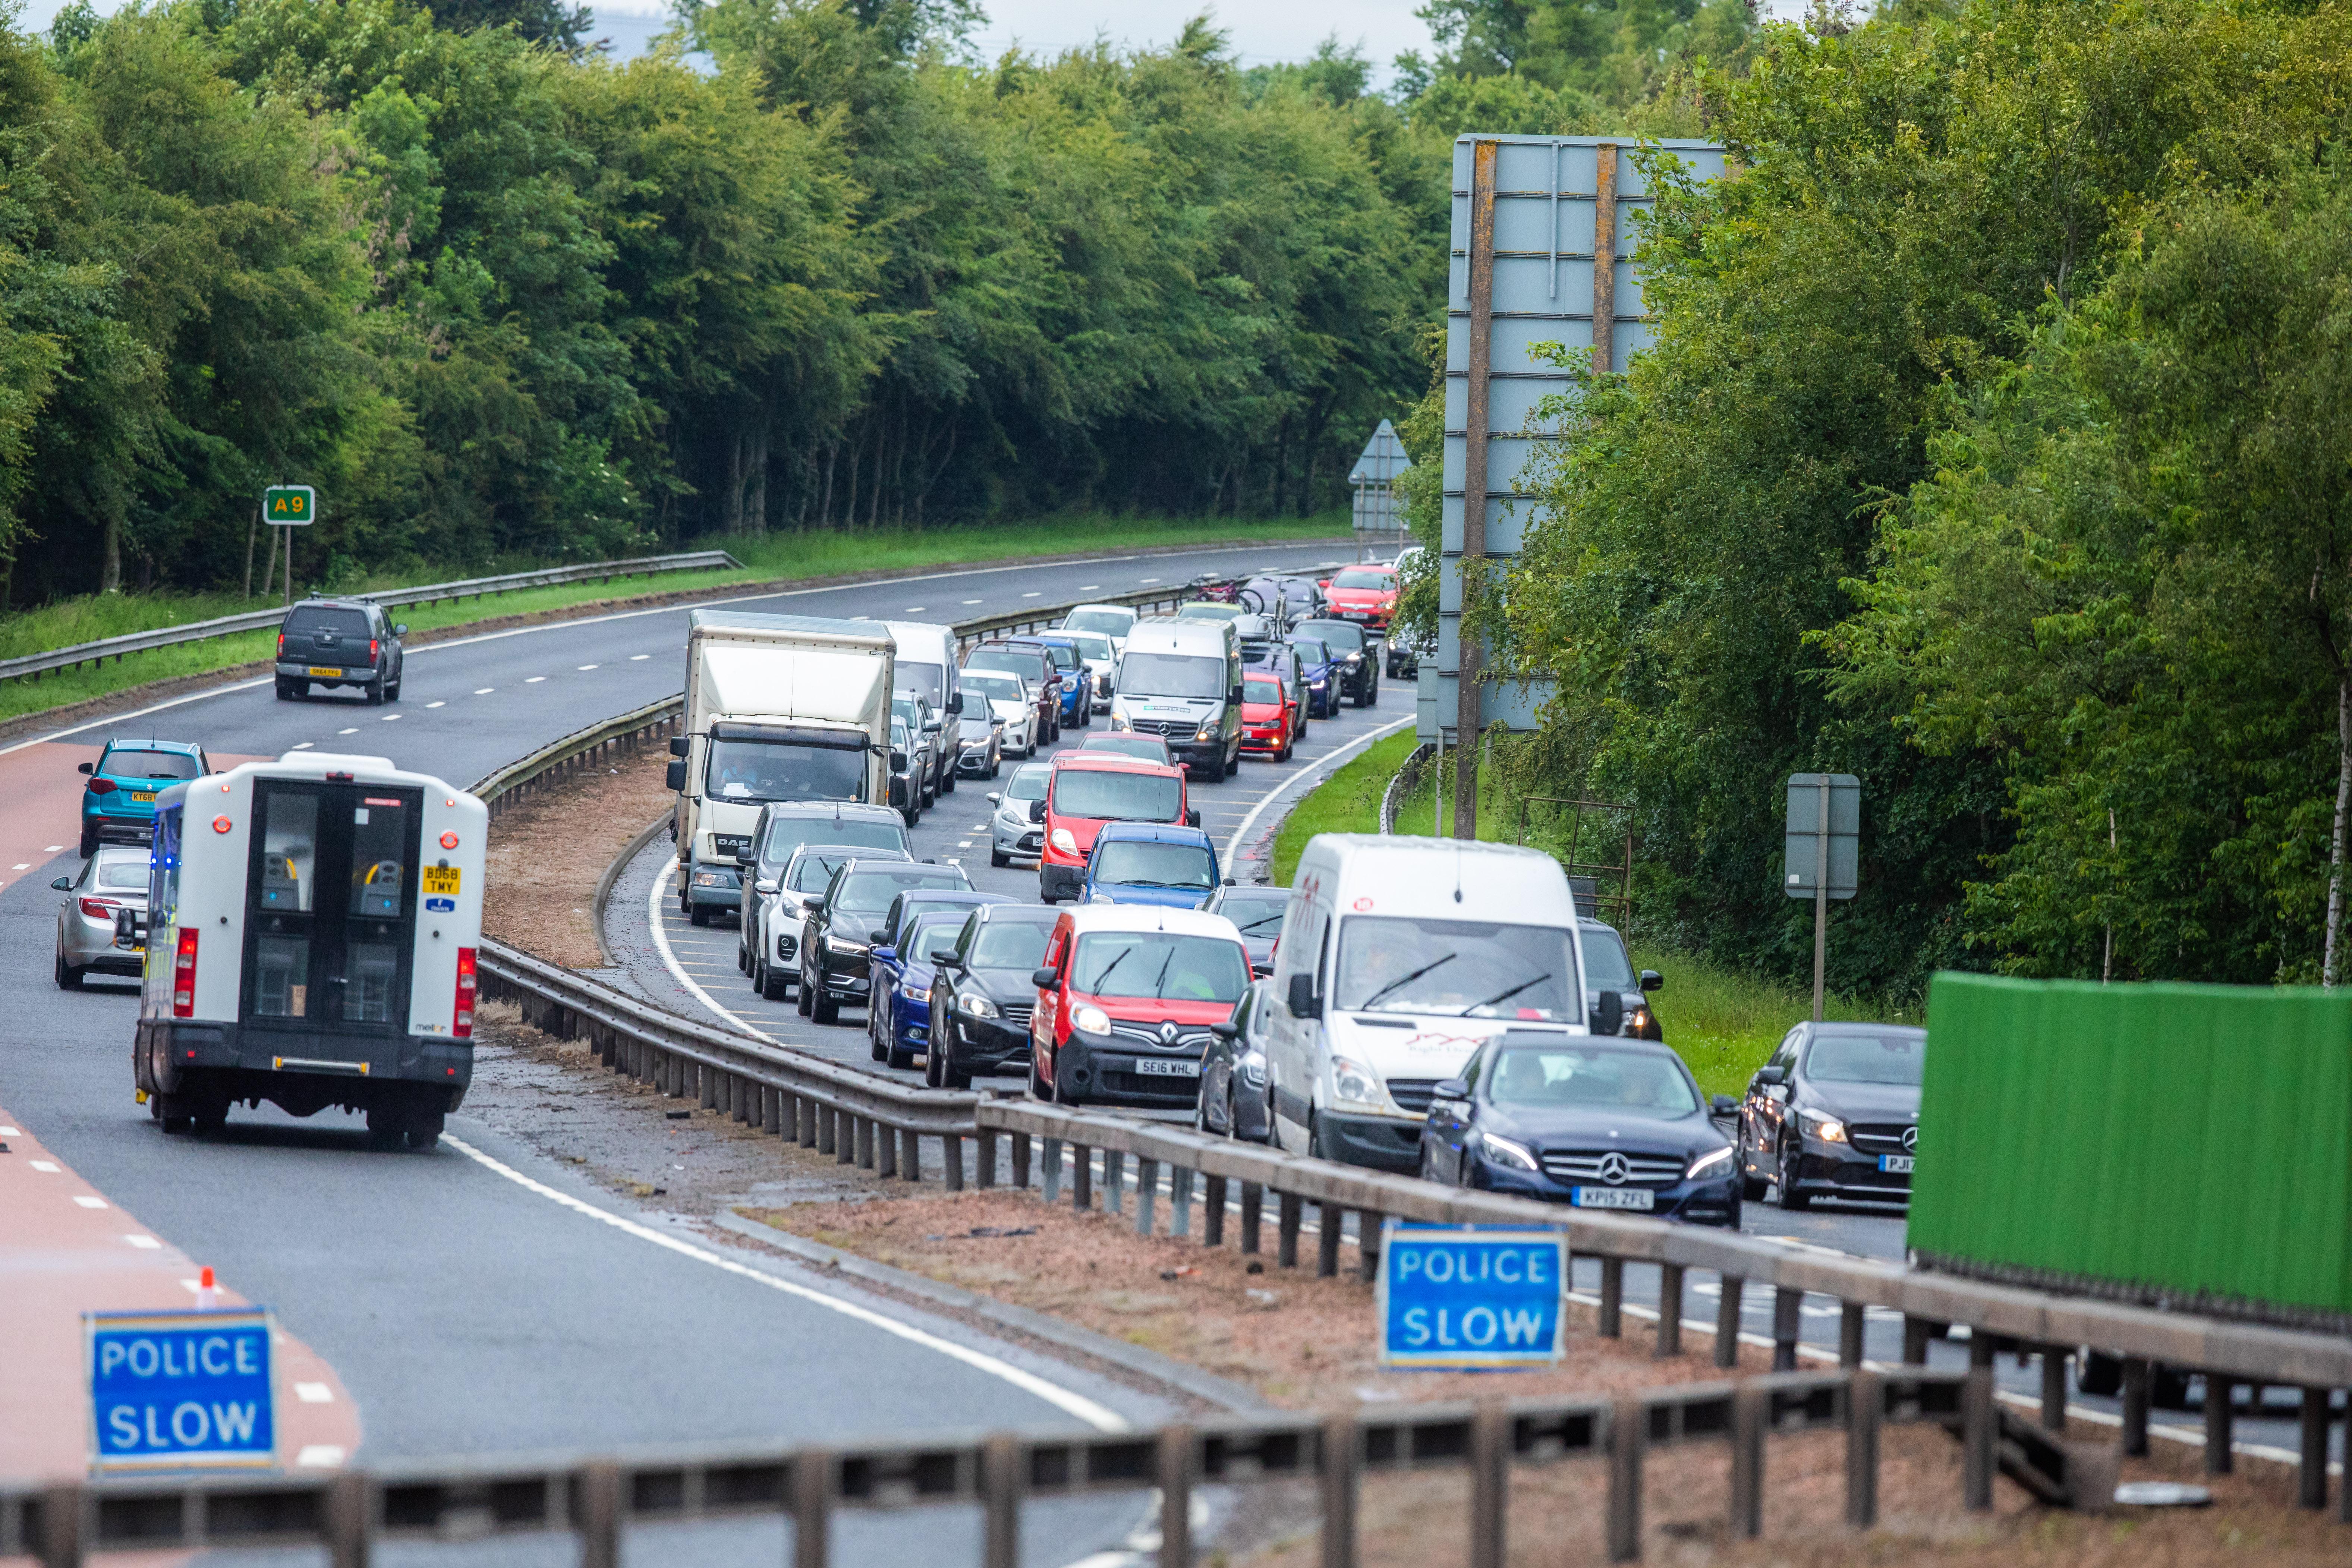 A9 Dual Carriageway, Near Broxden roundabout